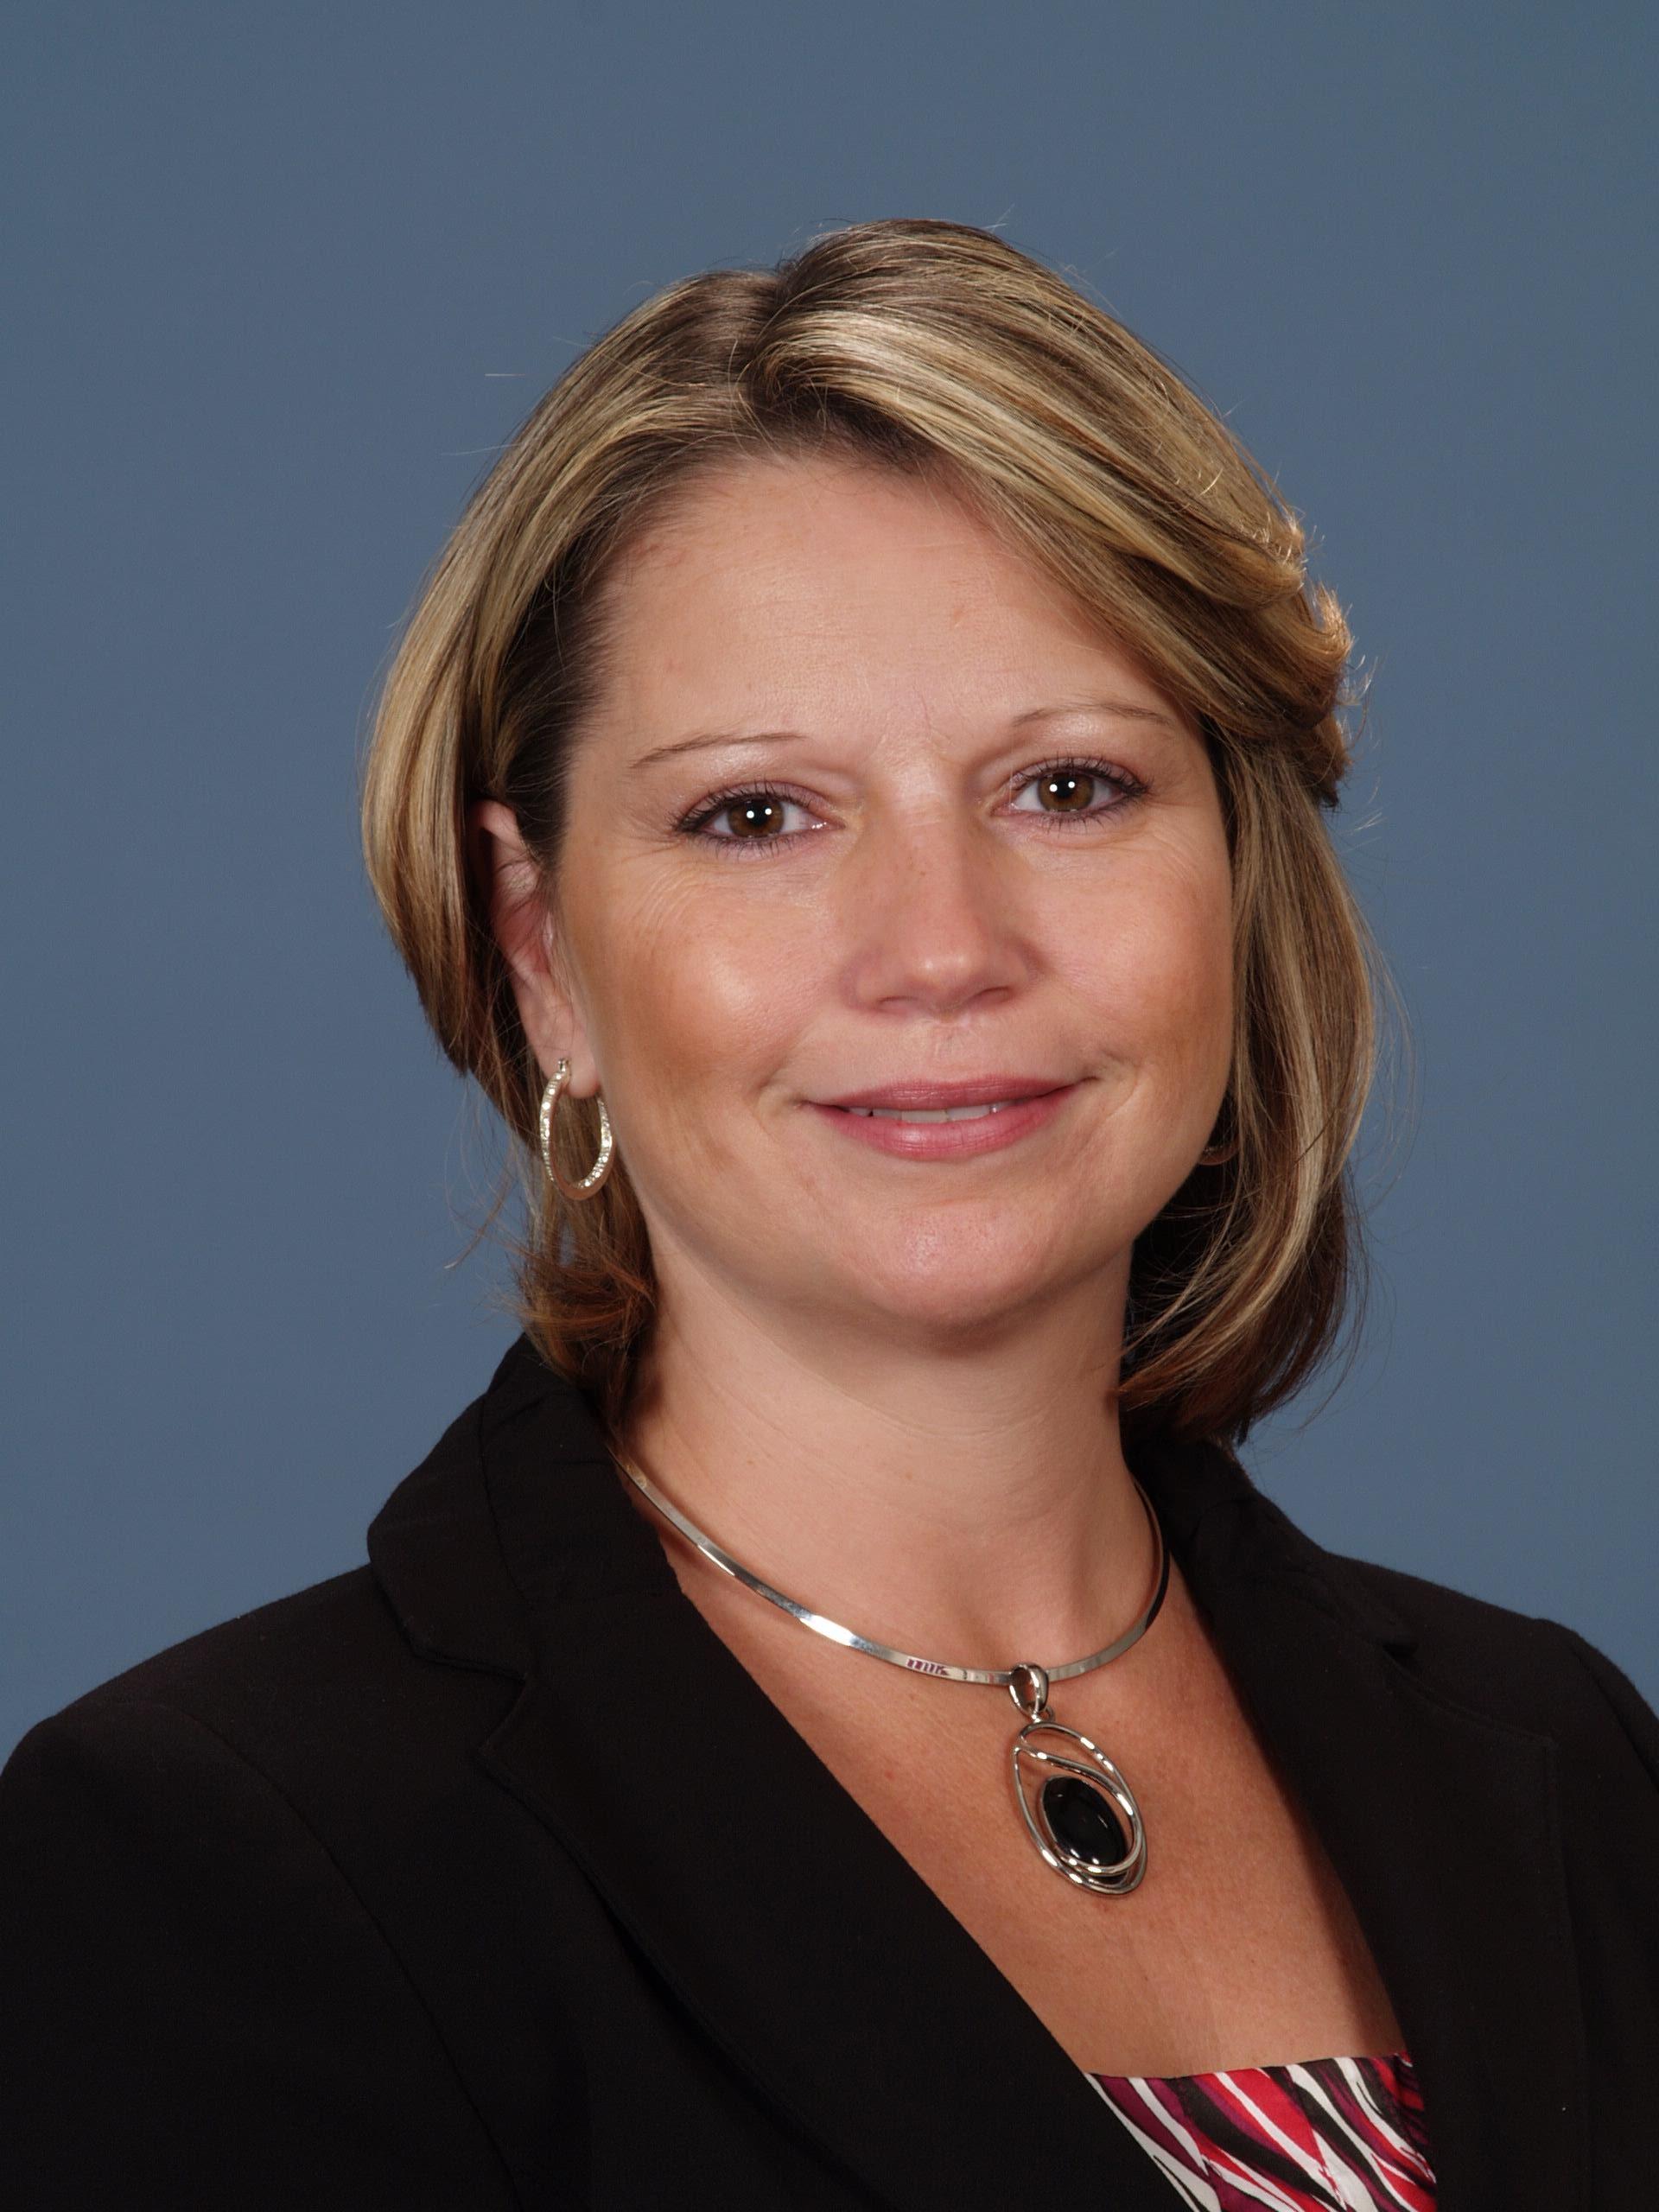 Cheryl McNamee